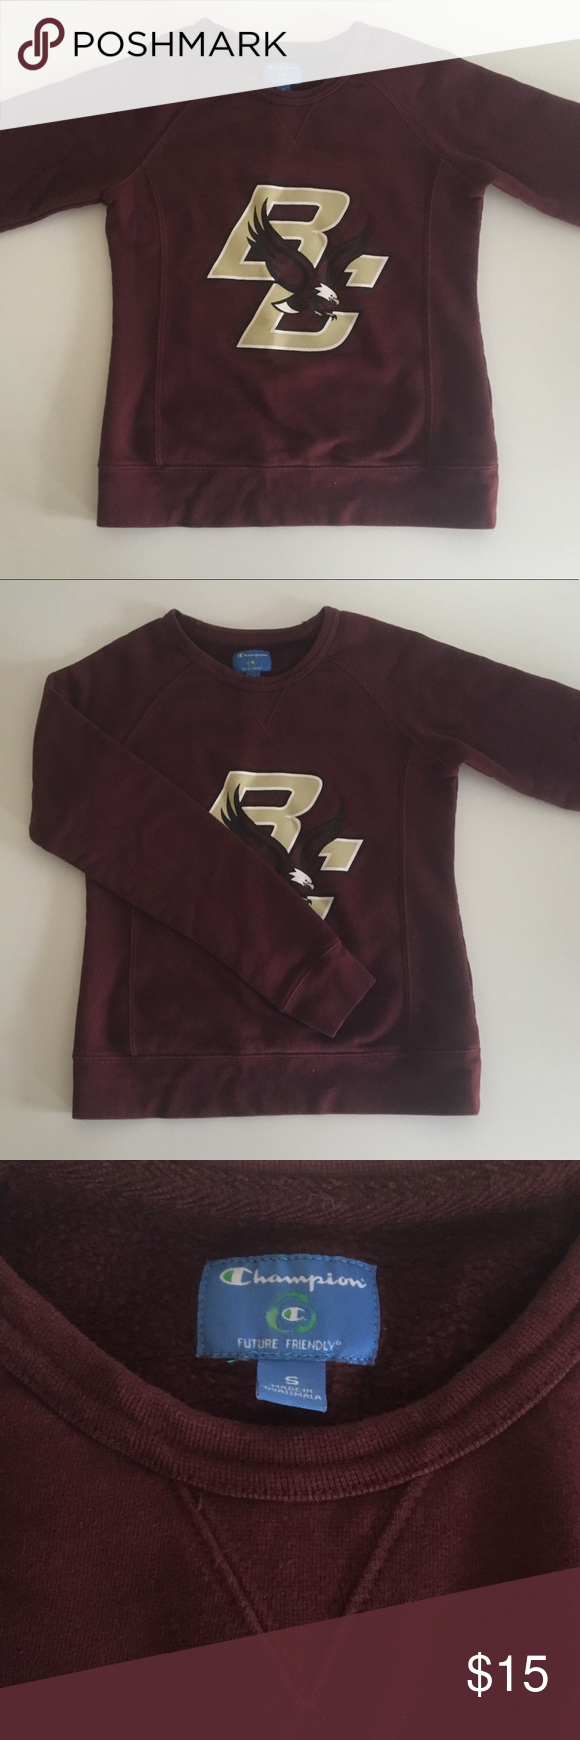 Boston College Pullover Sweatshirt Sweatshirts Pullover Sweatshirt Sweatshirt Tops [ 1740 x 580 Pixel ]